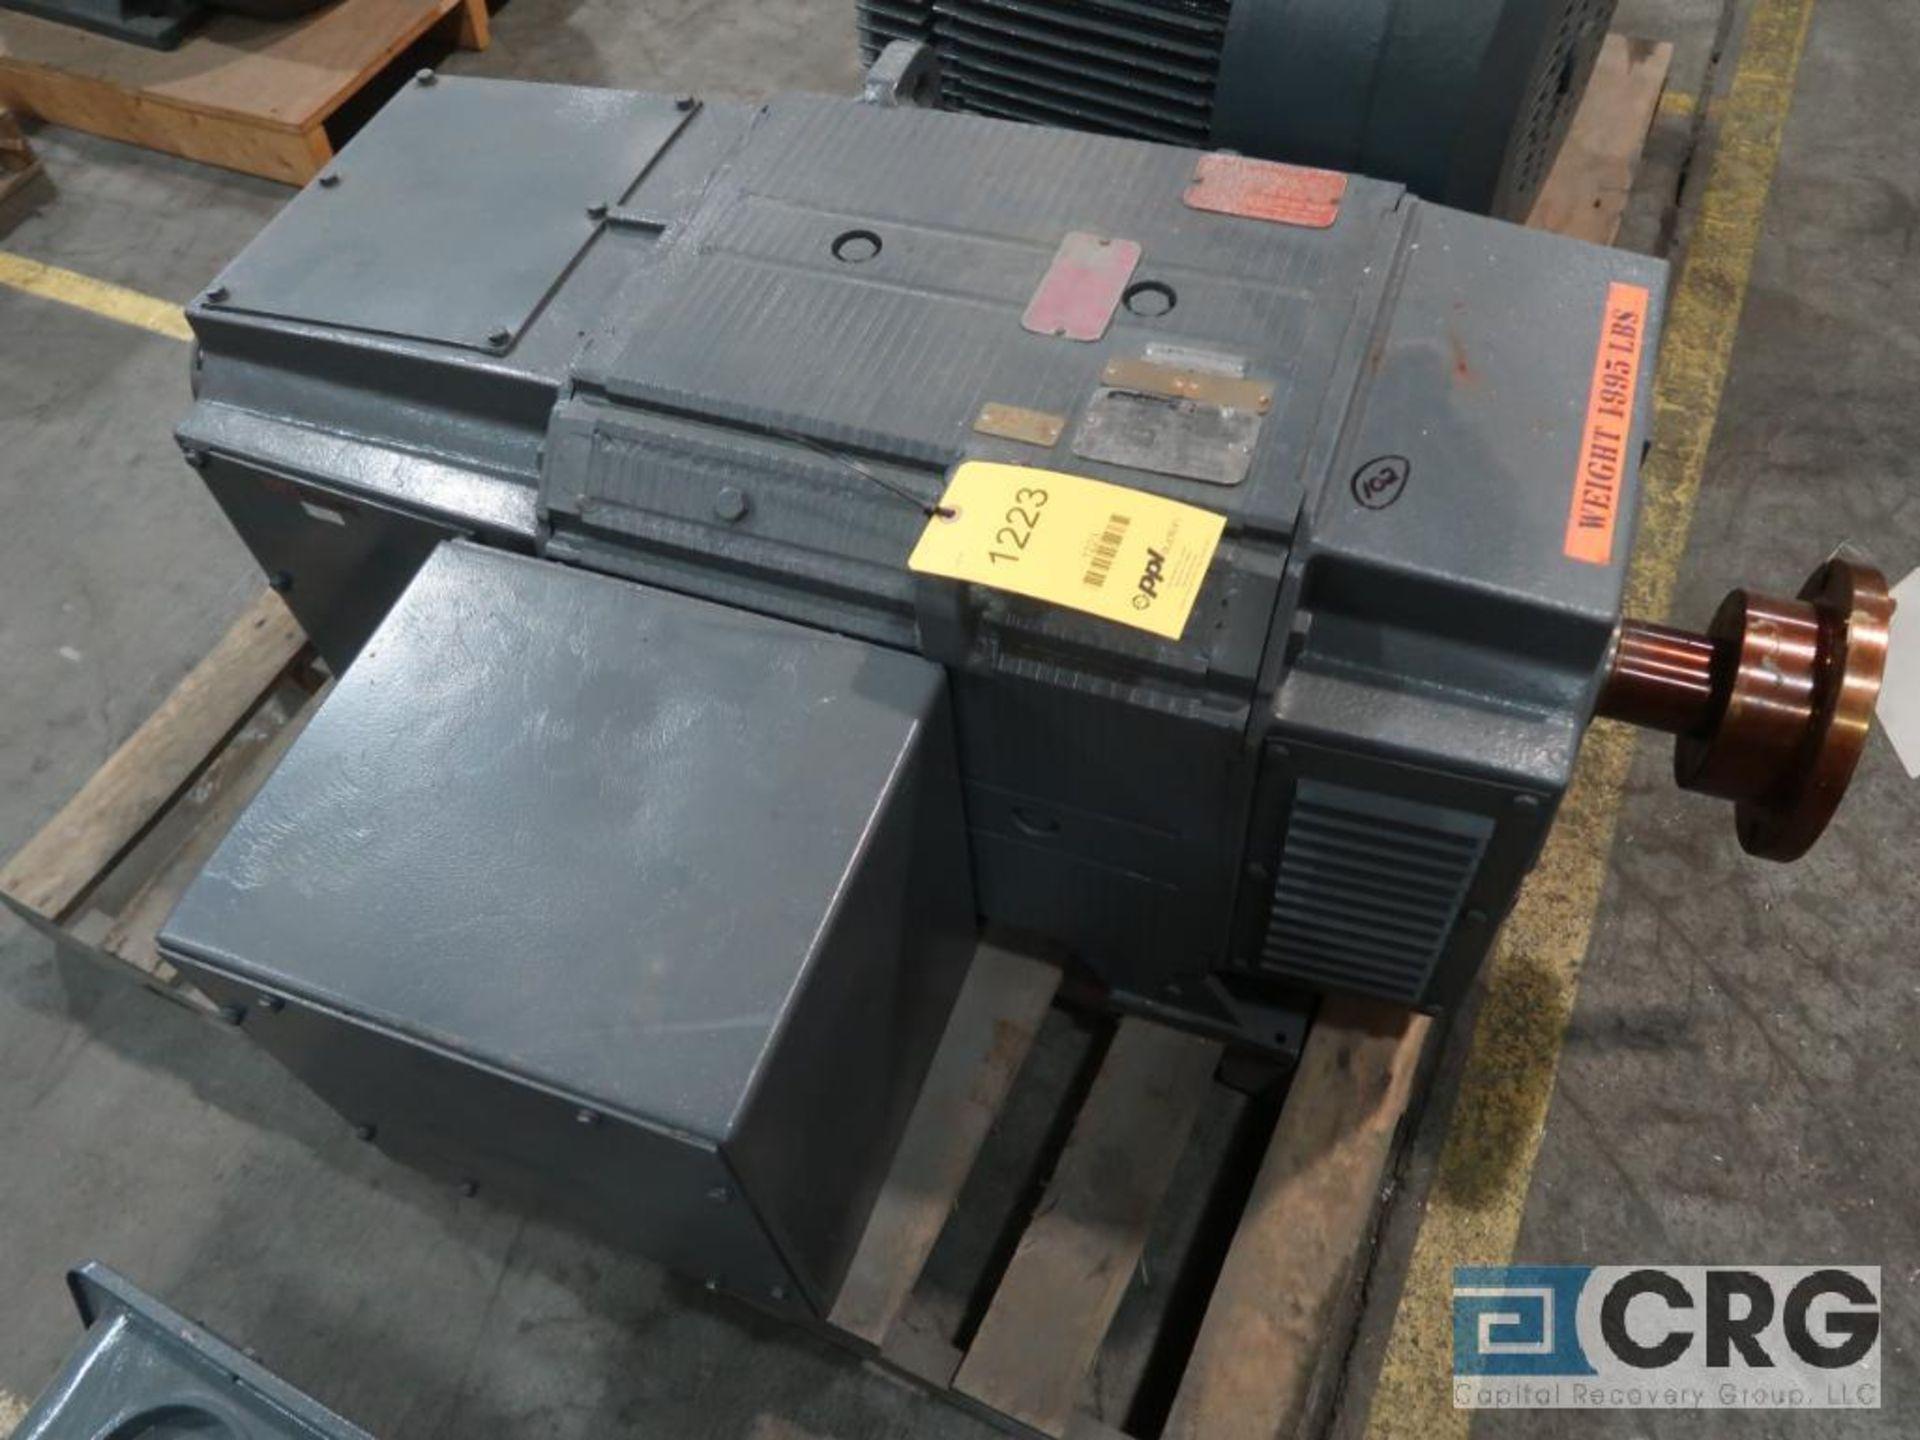 Reliance D-C motor, 50 HP, 500/2,000 RPMs, 500 volt, 3 ph., B0409ATZ frame (Finish Building)